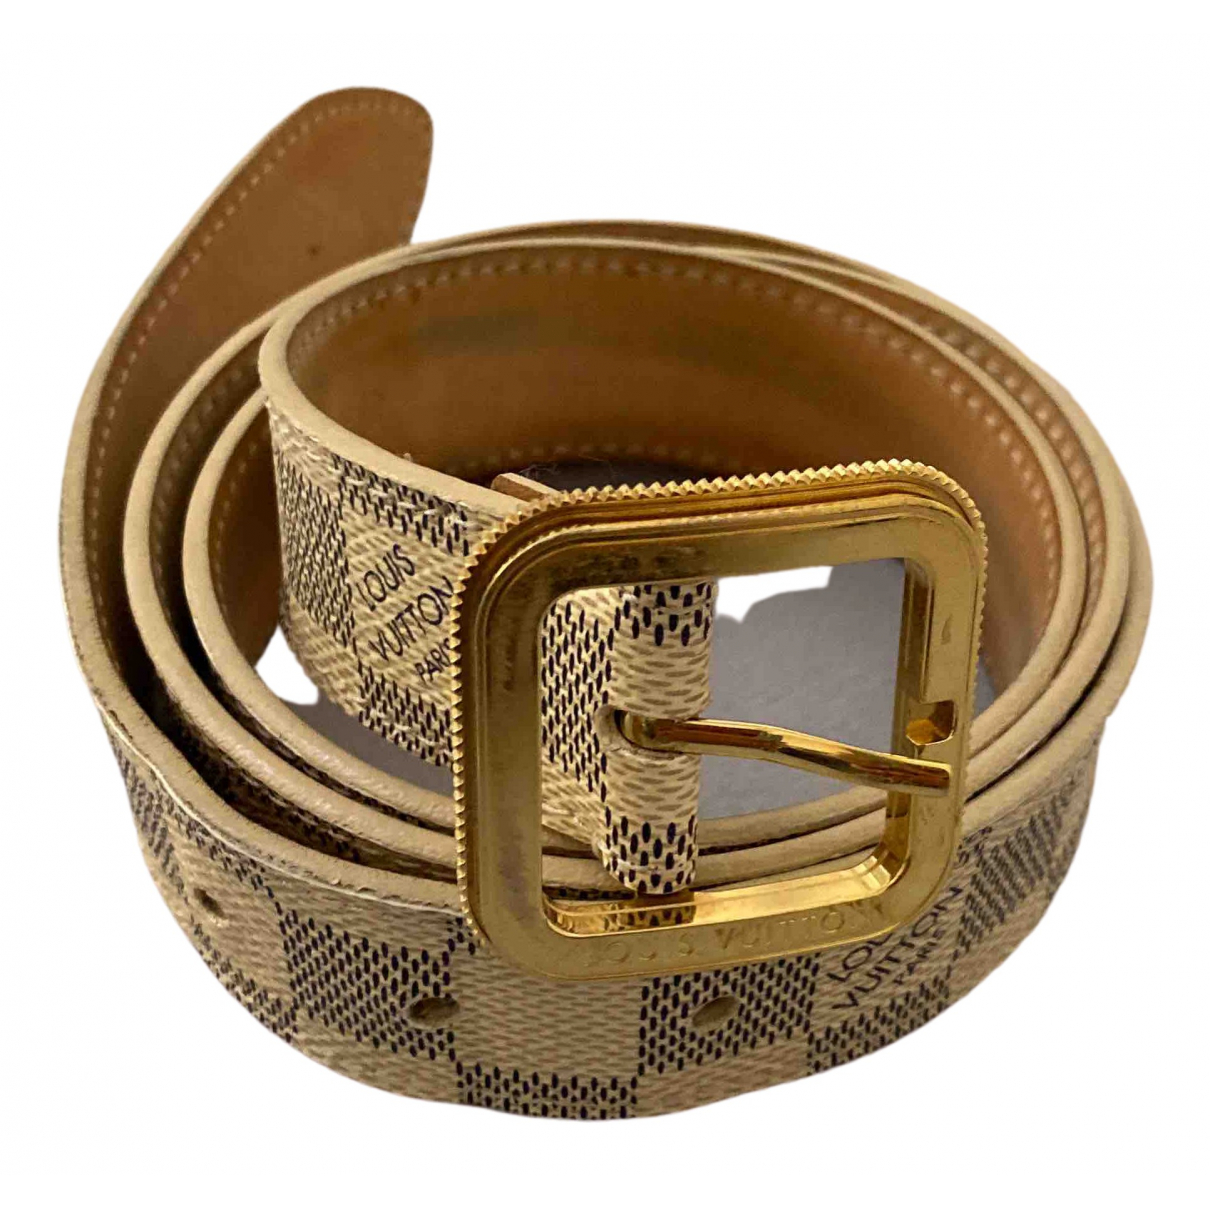 Louis Vuitton N Cloth belt for Women 95 cm